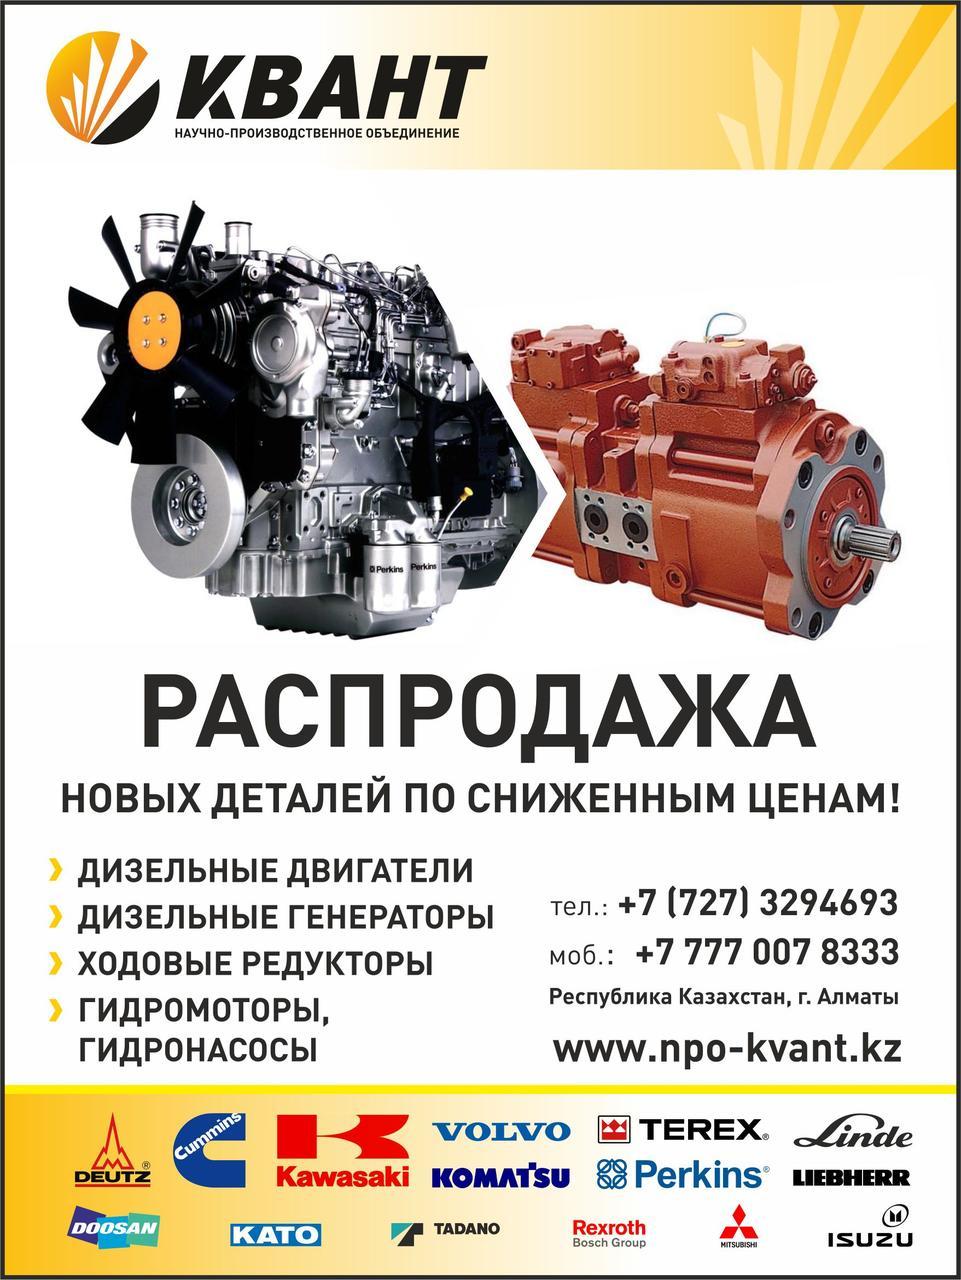 Двигатель Perkins 500, Perkins 510, Perkins 540, Perkins 540 V8, Perkins 6354, Perkins 6354.2, Perkins 640